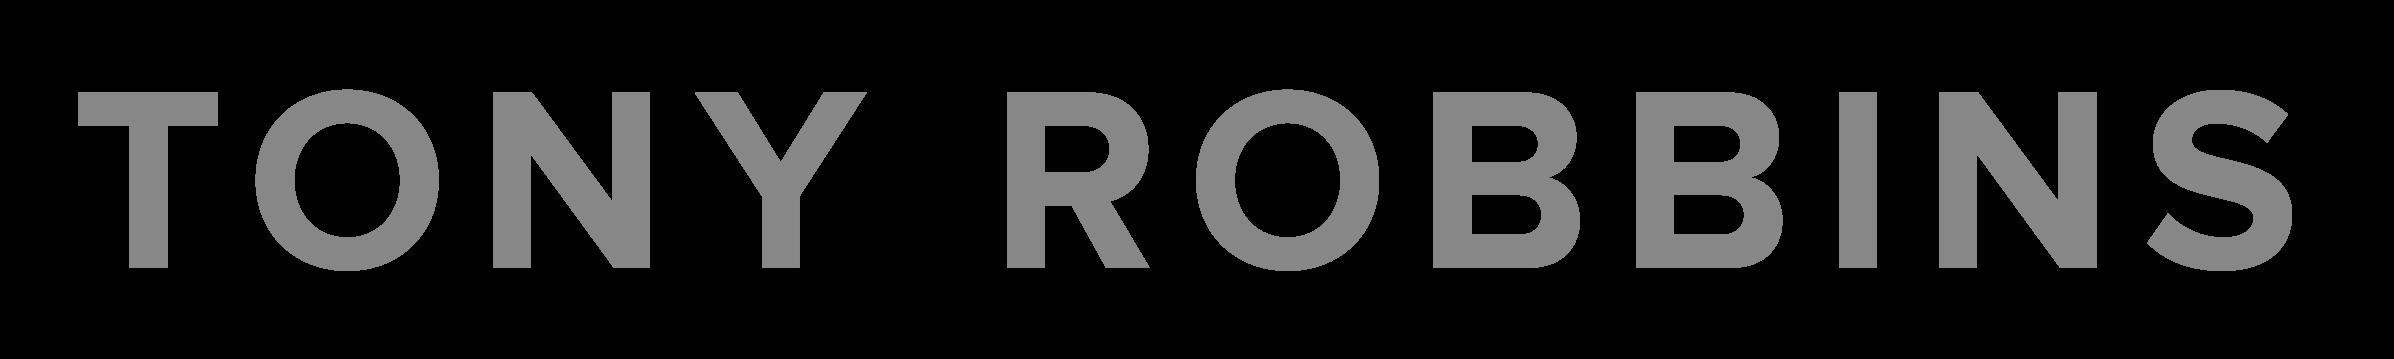 tr-logo-blk-horz